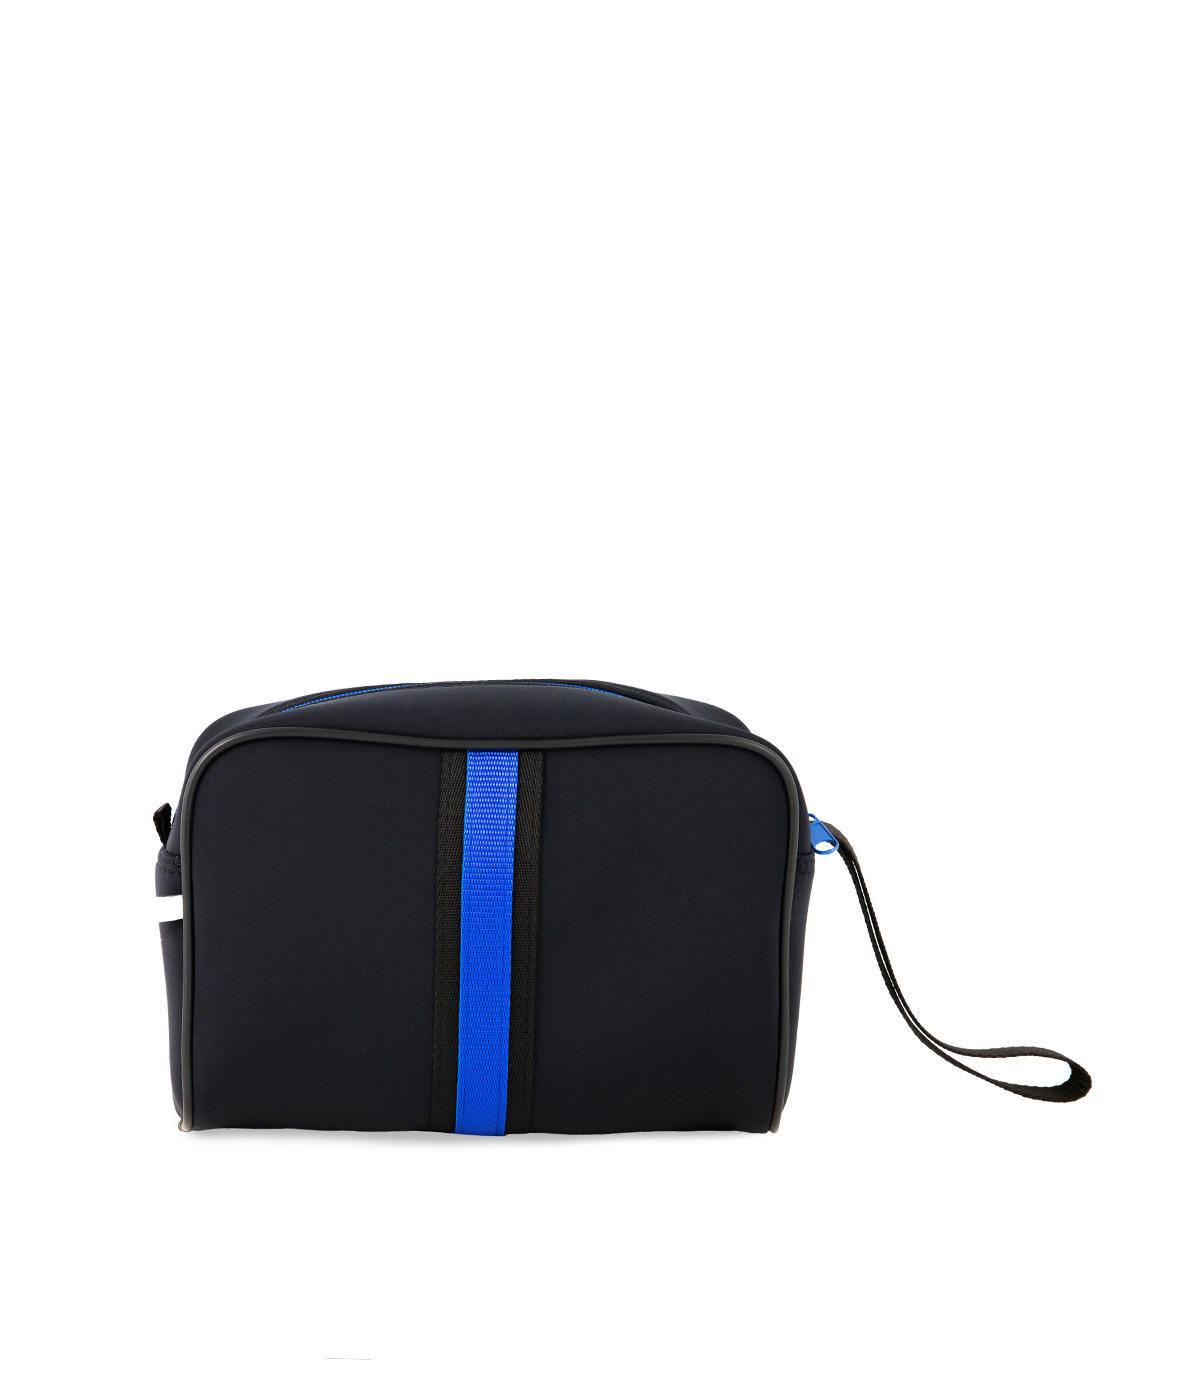 Beauty Case Neoprene Impermeabile Quitto Bags